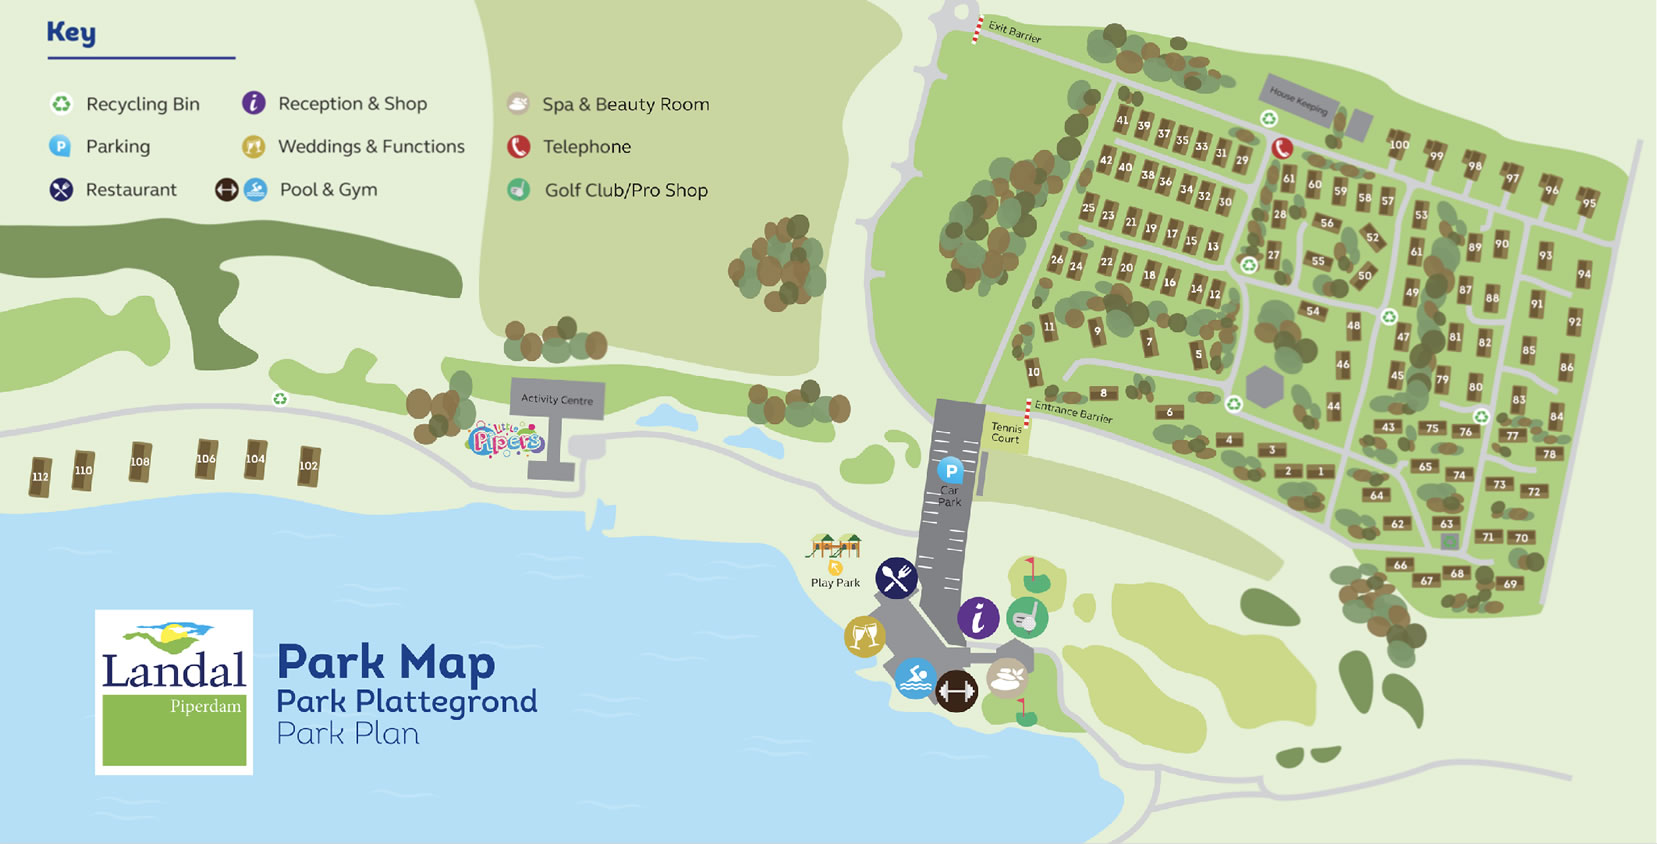 Resort Map | Piperdam